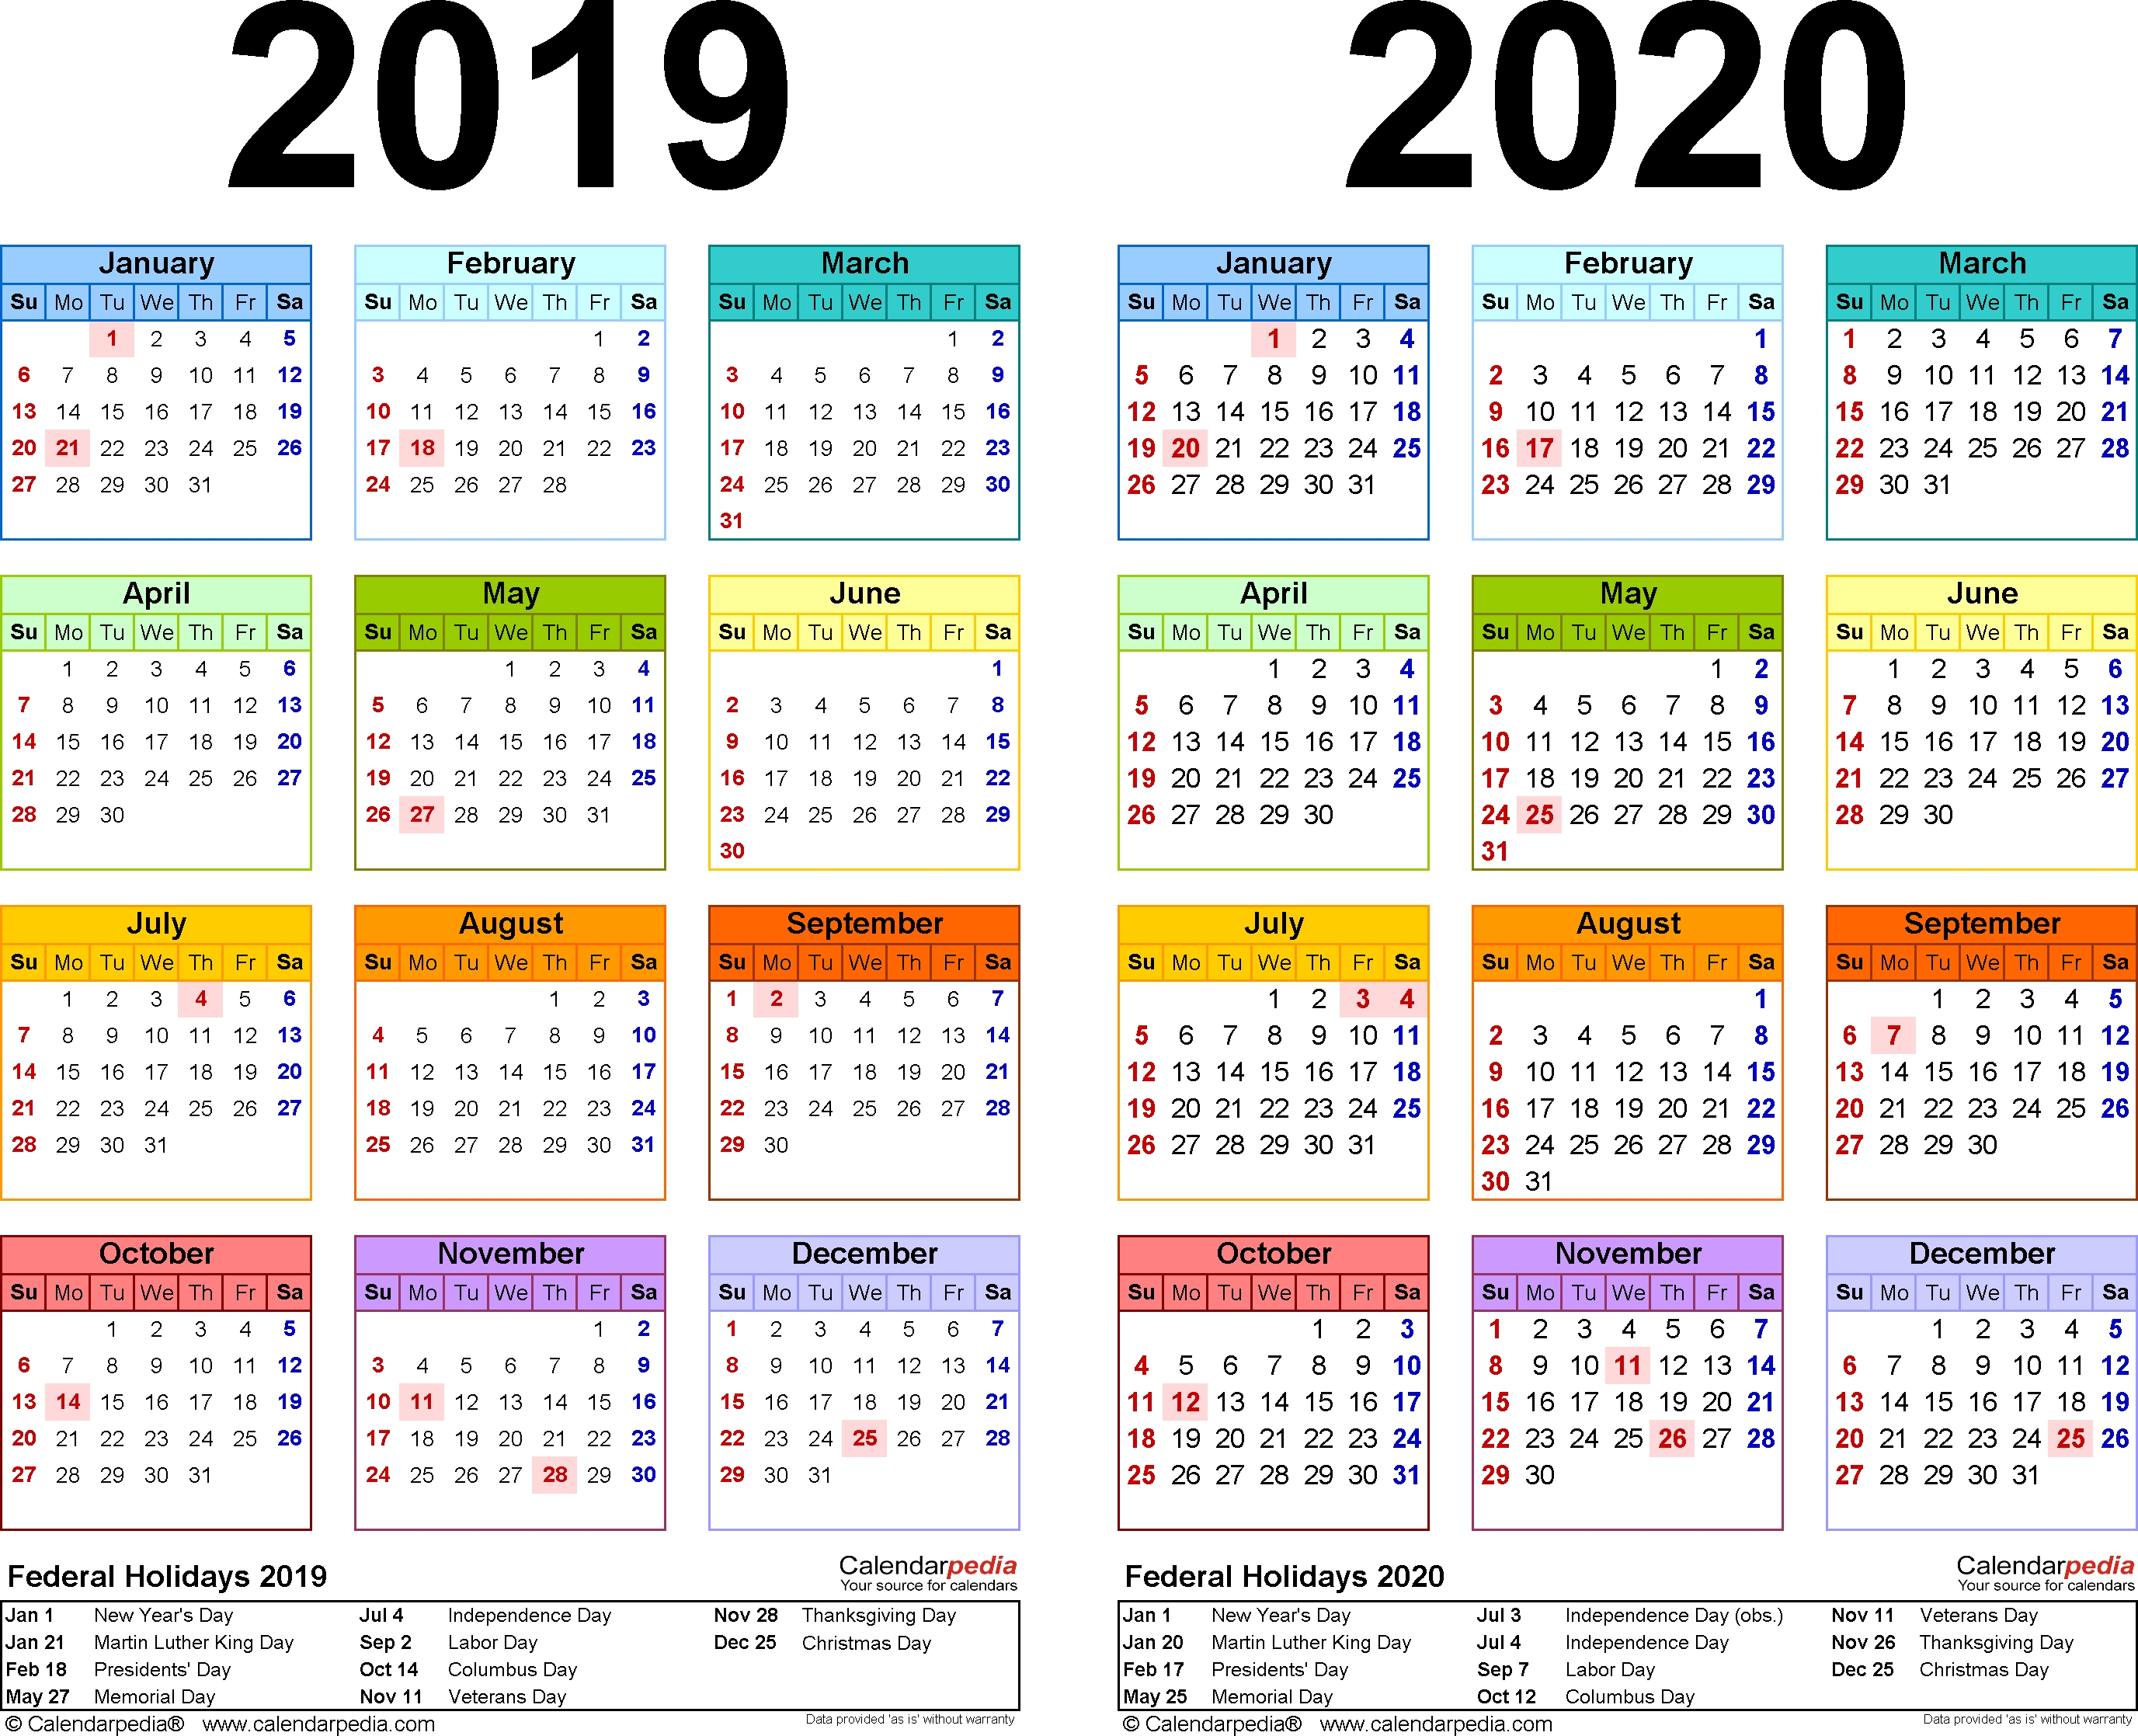 2019-2020 Calendar - Free Printable Two-Year Pdf Calendars in 2019 - 2020 Printable Fill In Calendar